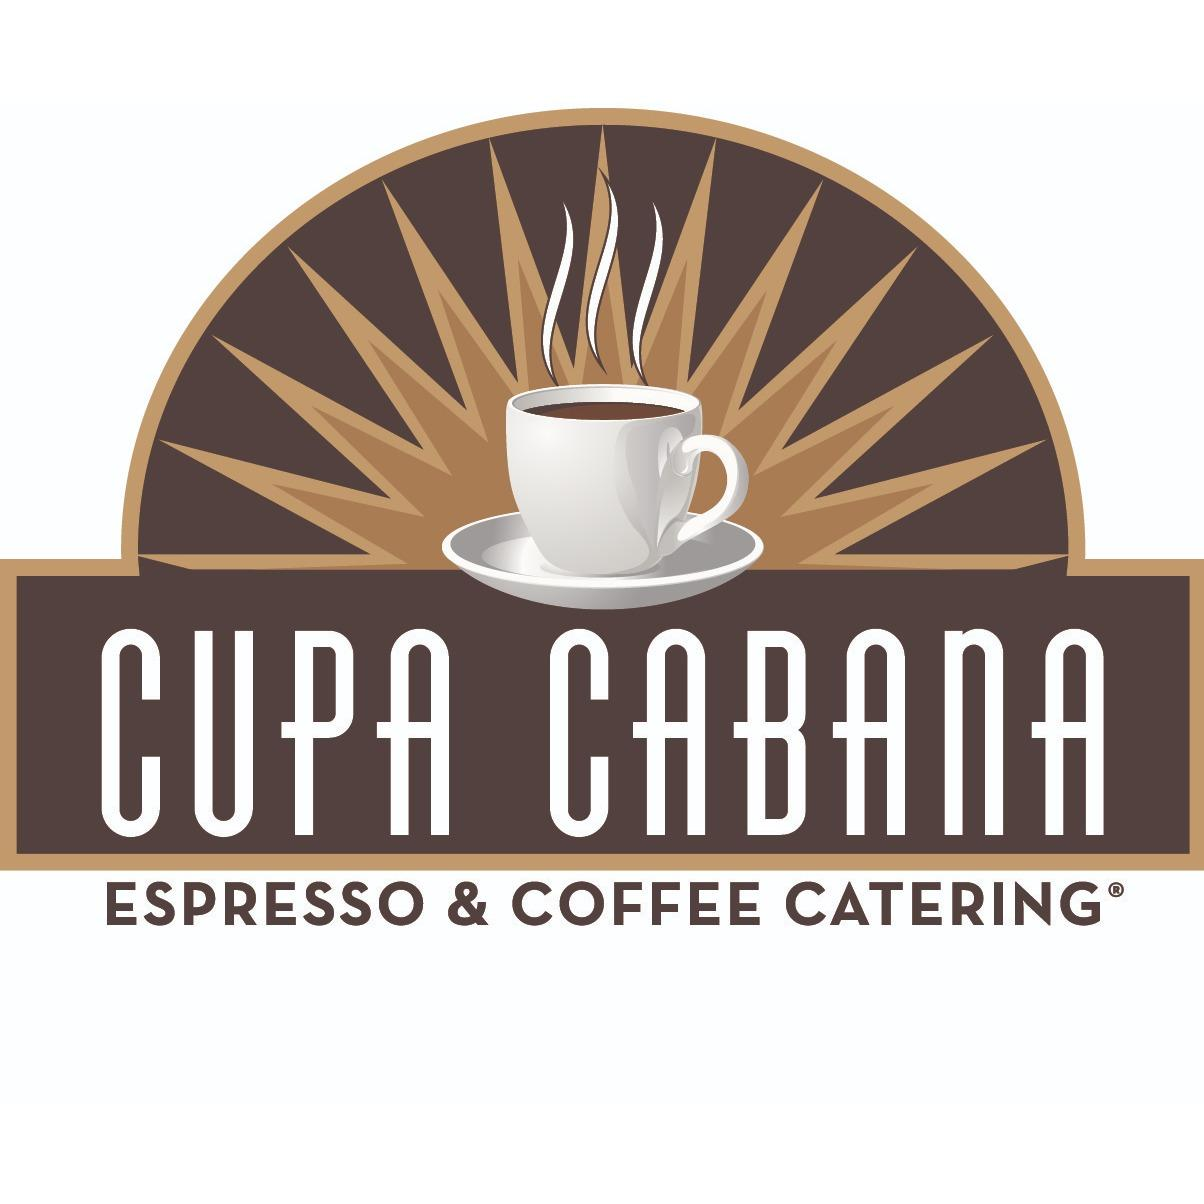 Cupa Cabana Espresso & Coffee Catering